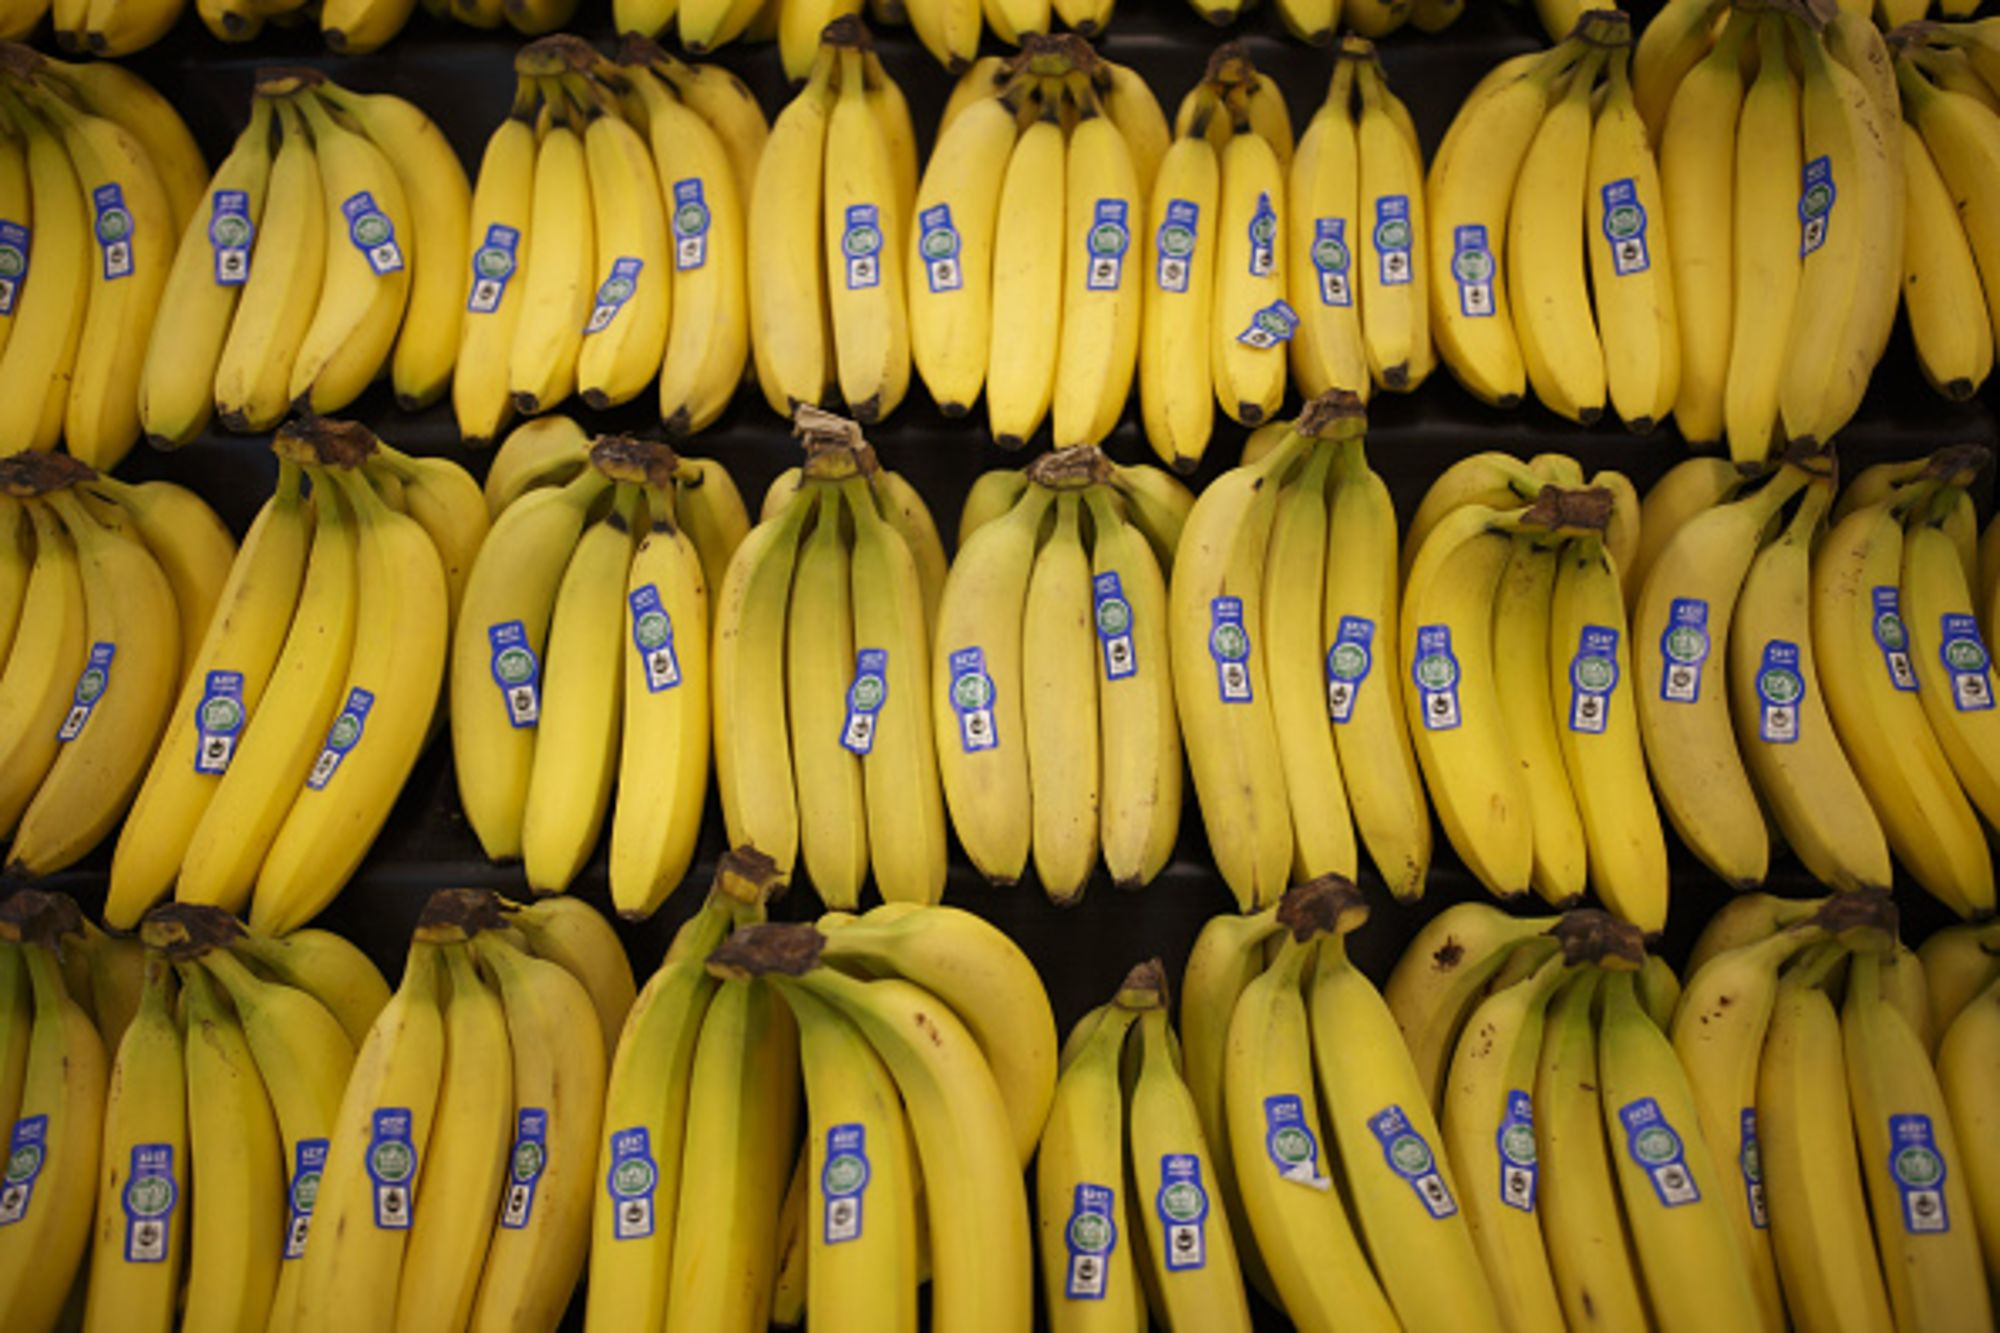 The Bananapocalypse Is Nigh thumbnail